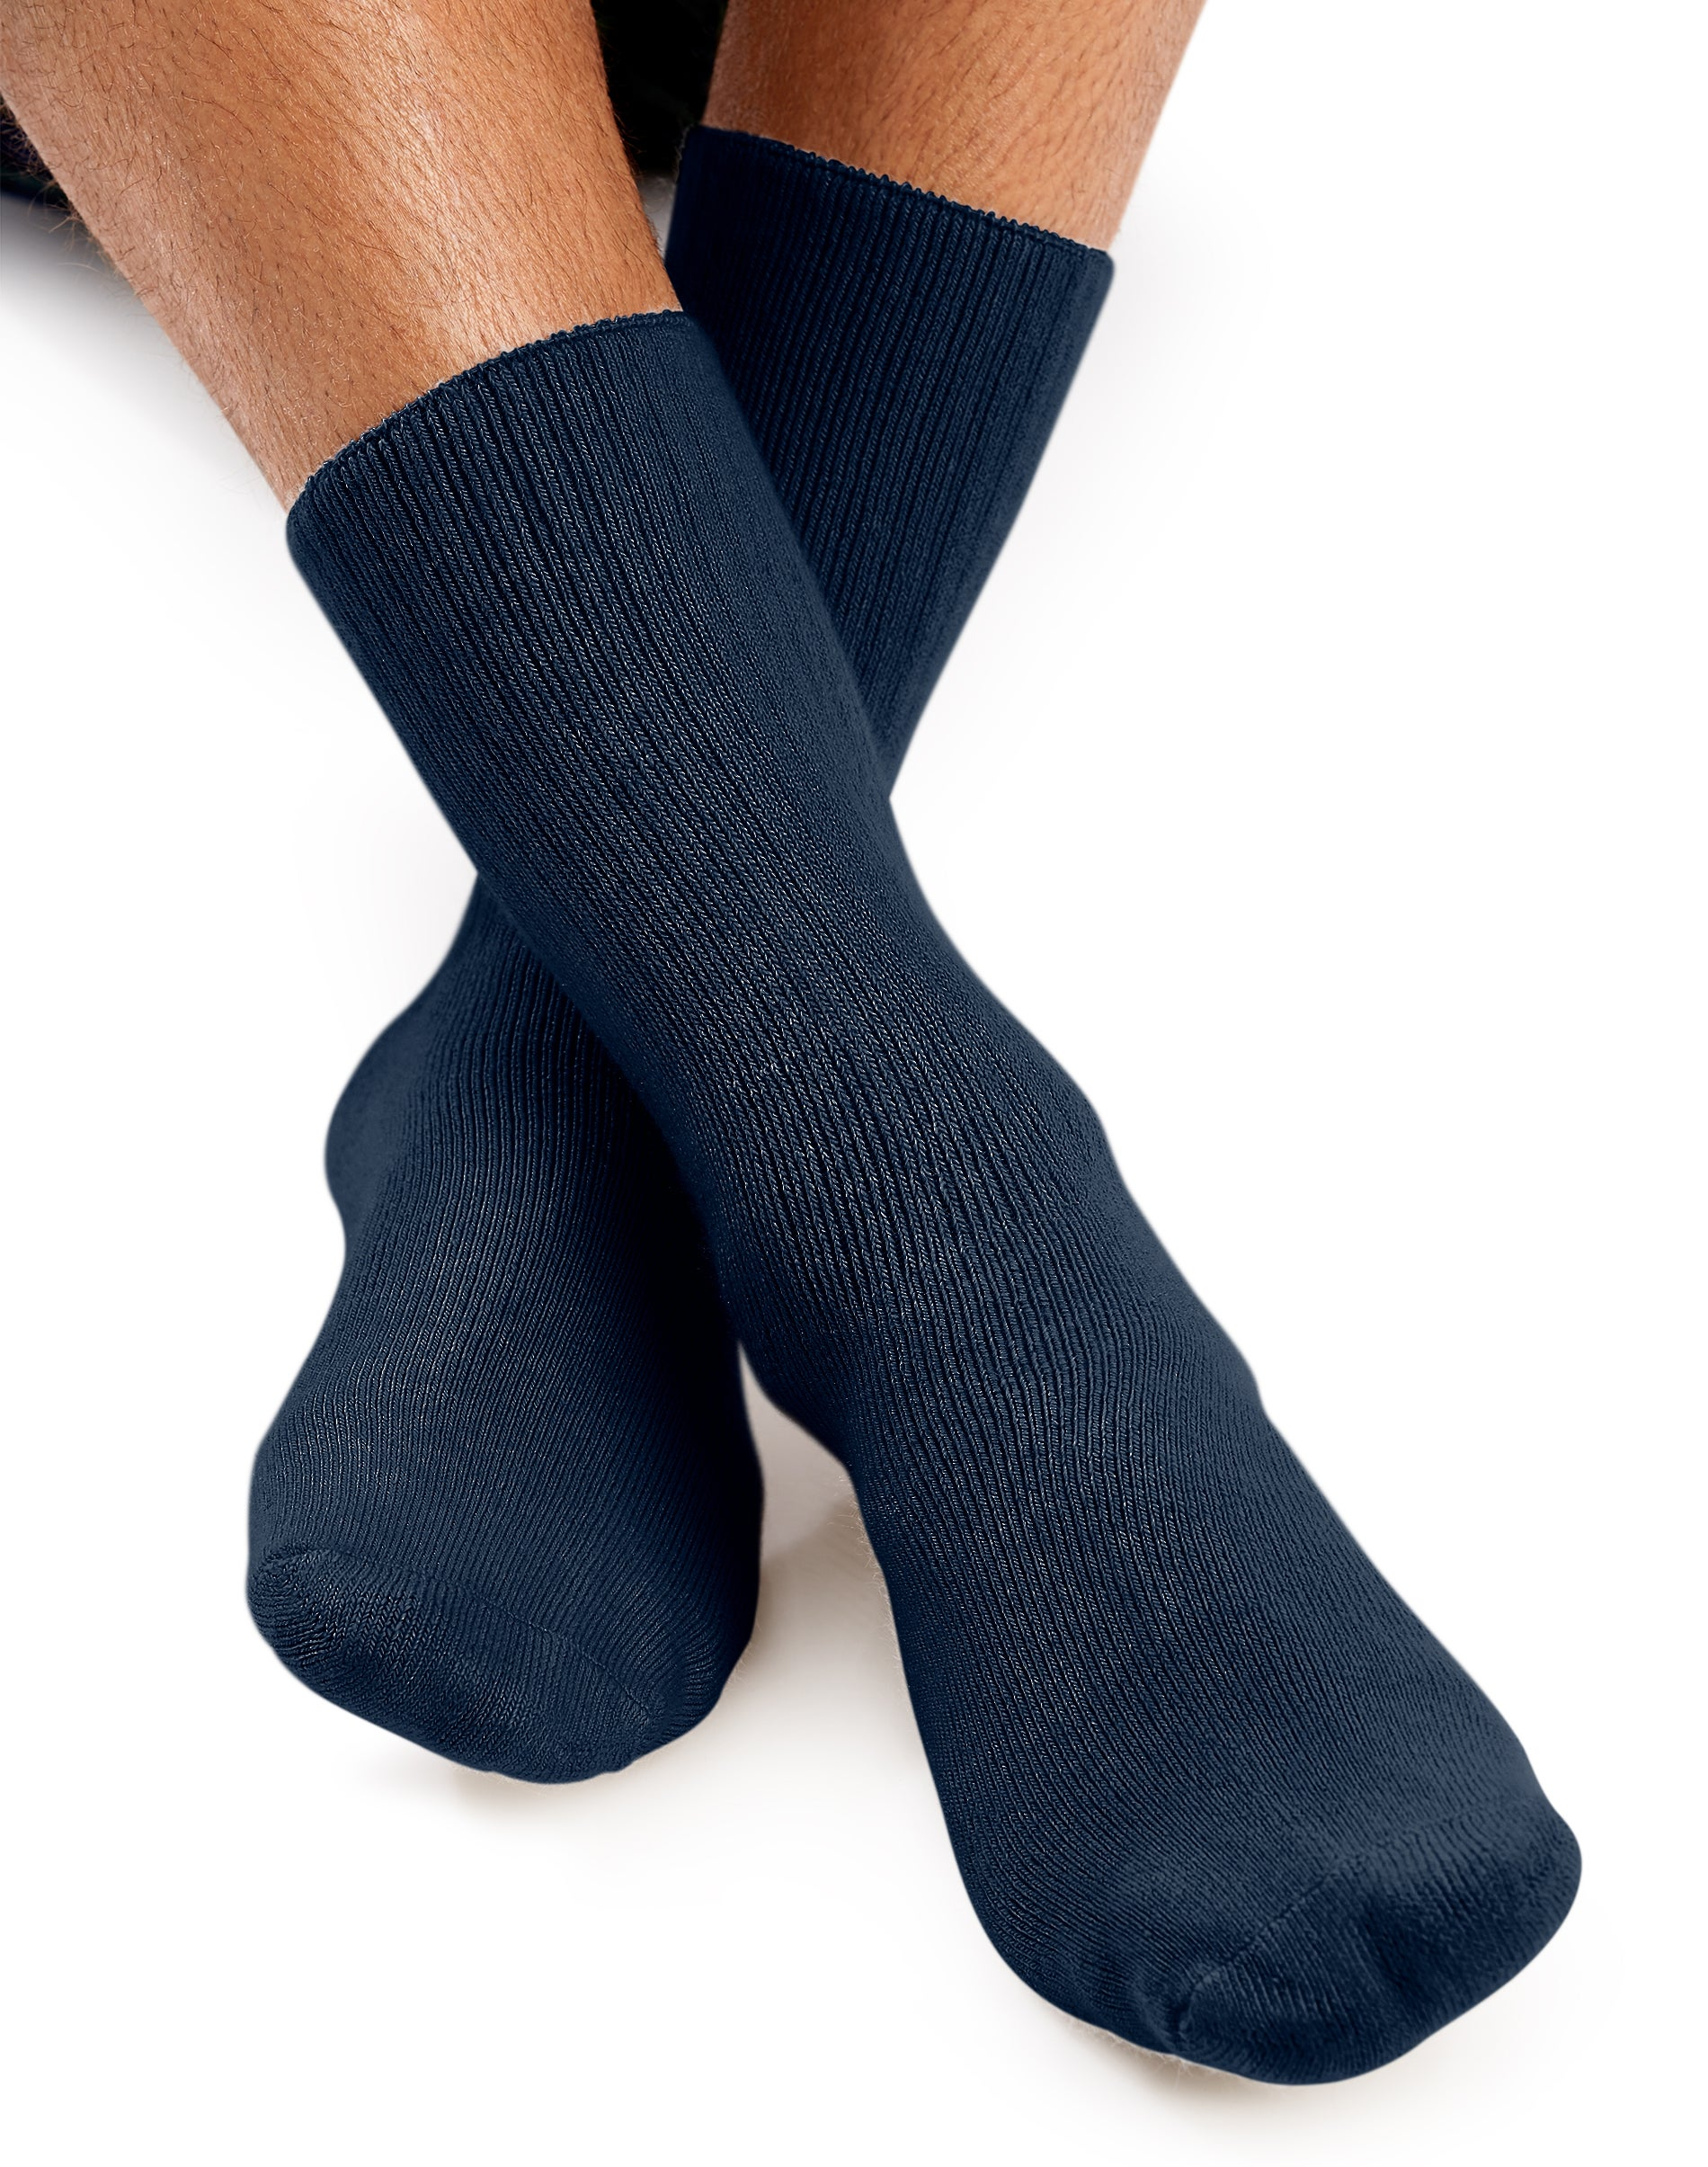 World/'s Softest Socks 3 Pair Beige Crew Large Men/'s//Ladies Sock Size 10-13